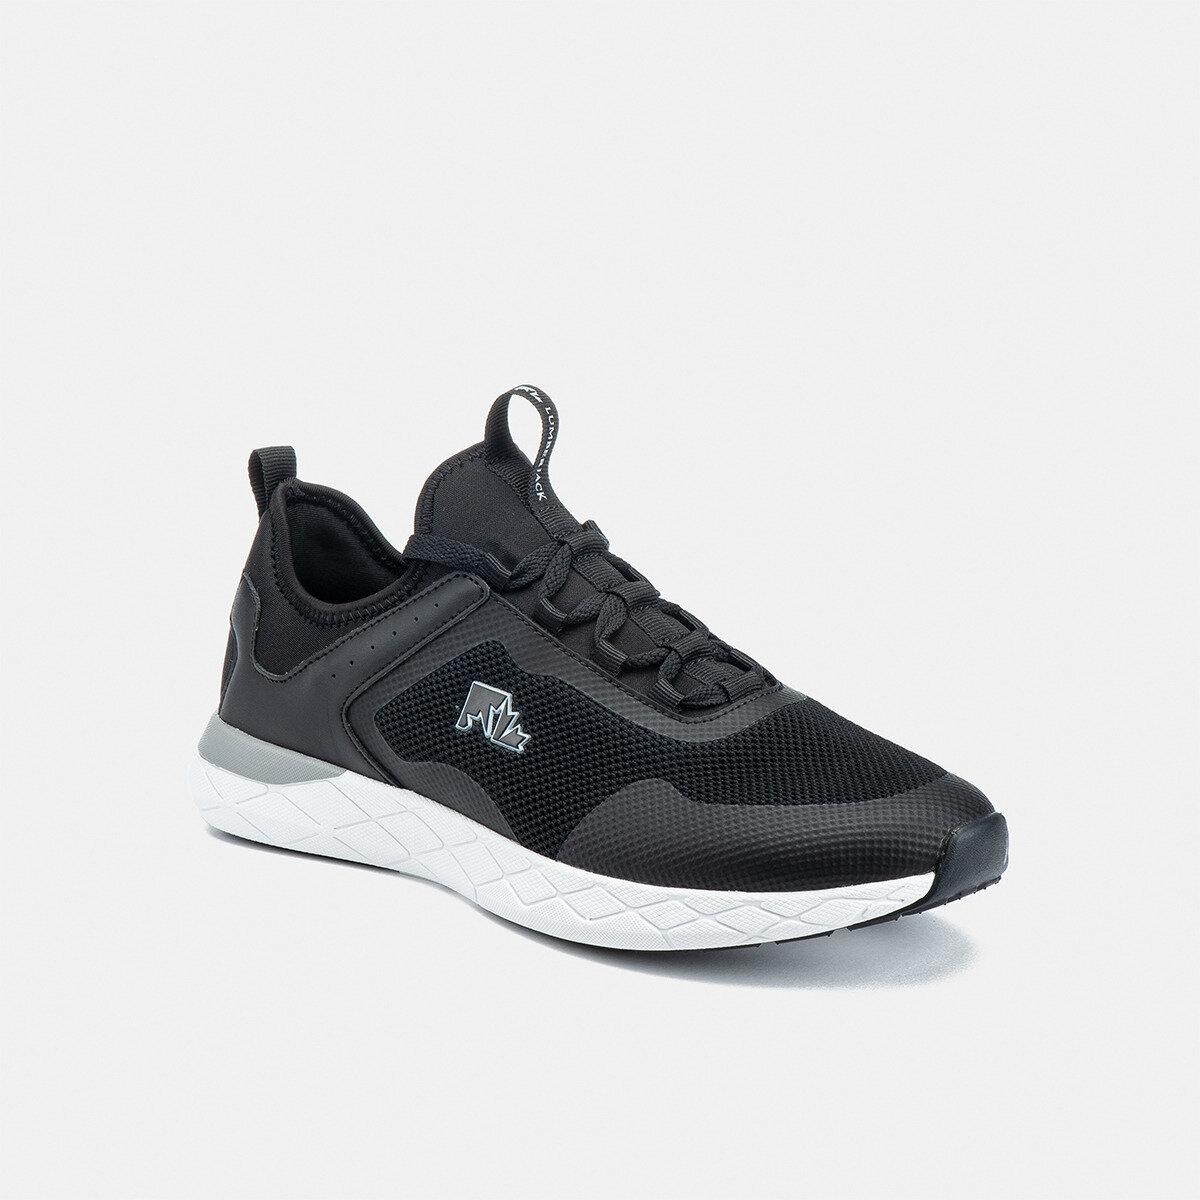 RENT BLACK Man Running shoes